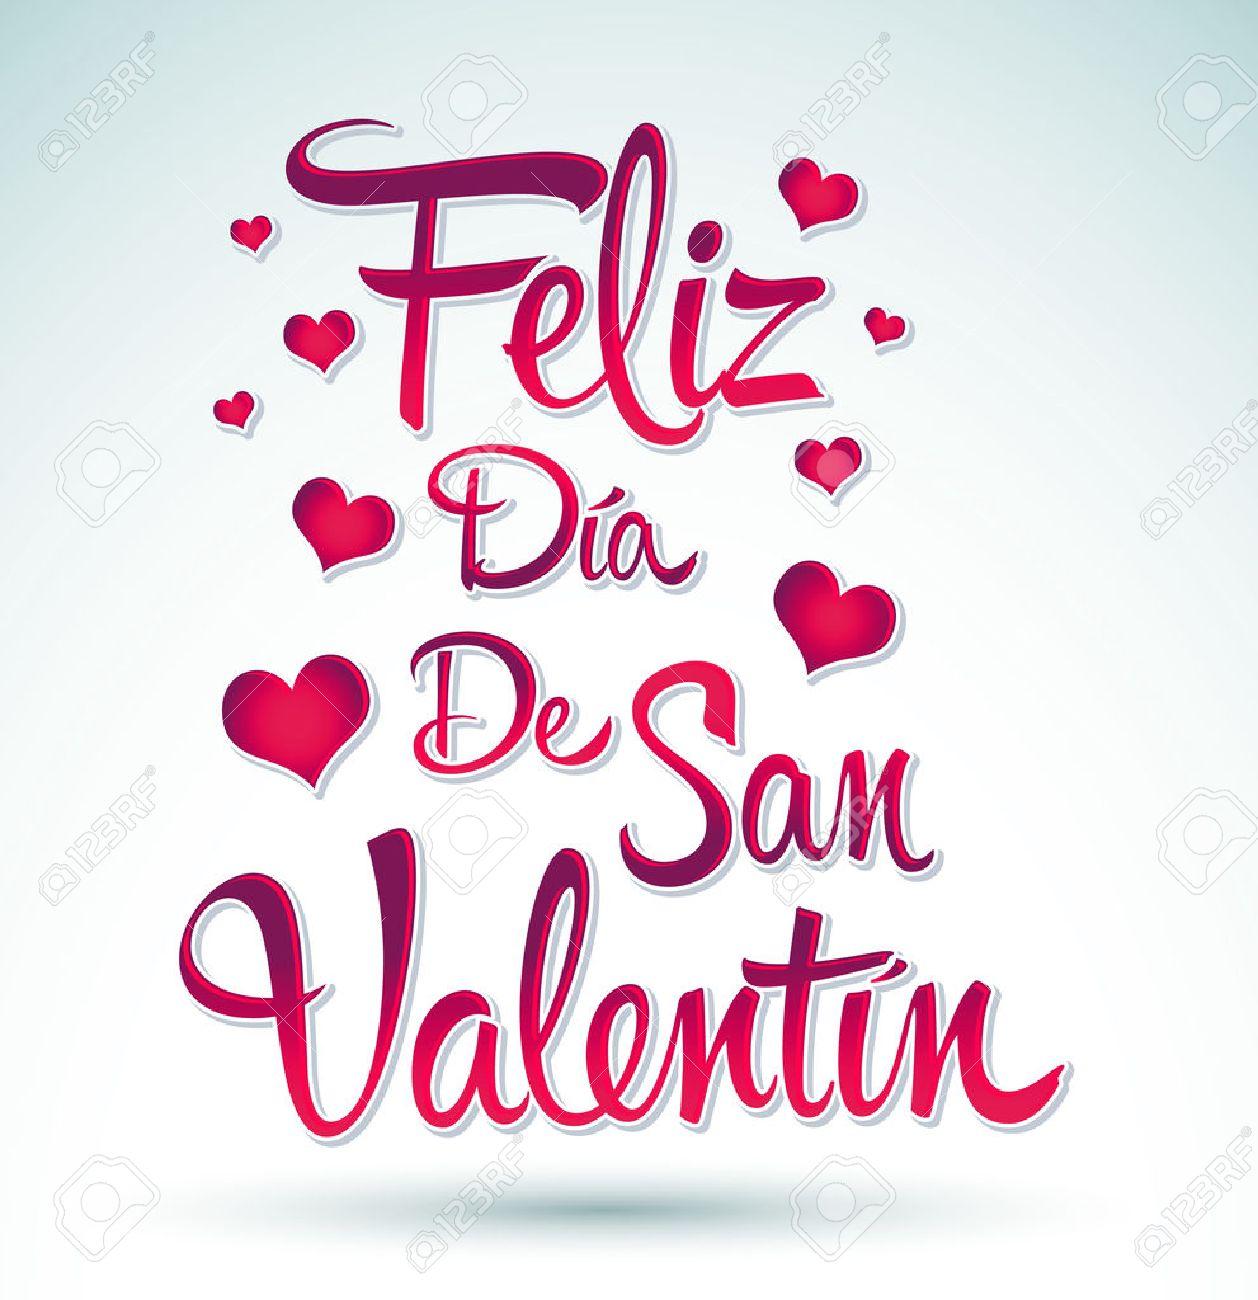 Feliz Dia De San Valentin   Happy Valentines Day Spanish Text   Vector  Lettering Stock Vector